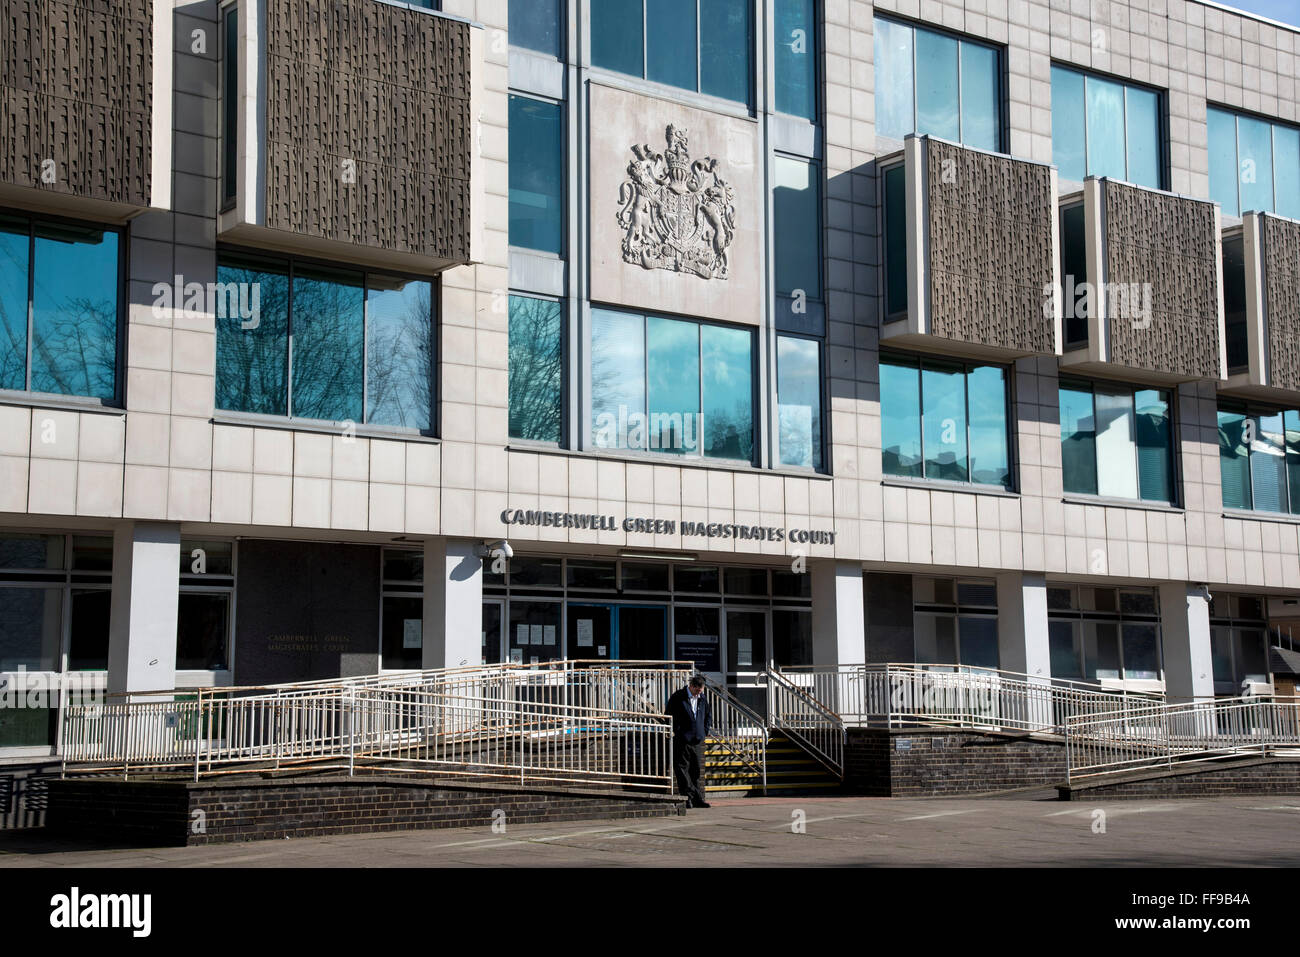 Camberwell Green Magistrates Court GV-Eingang Stockbild